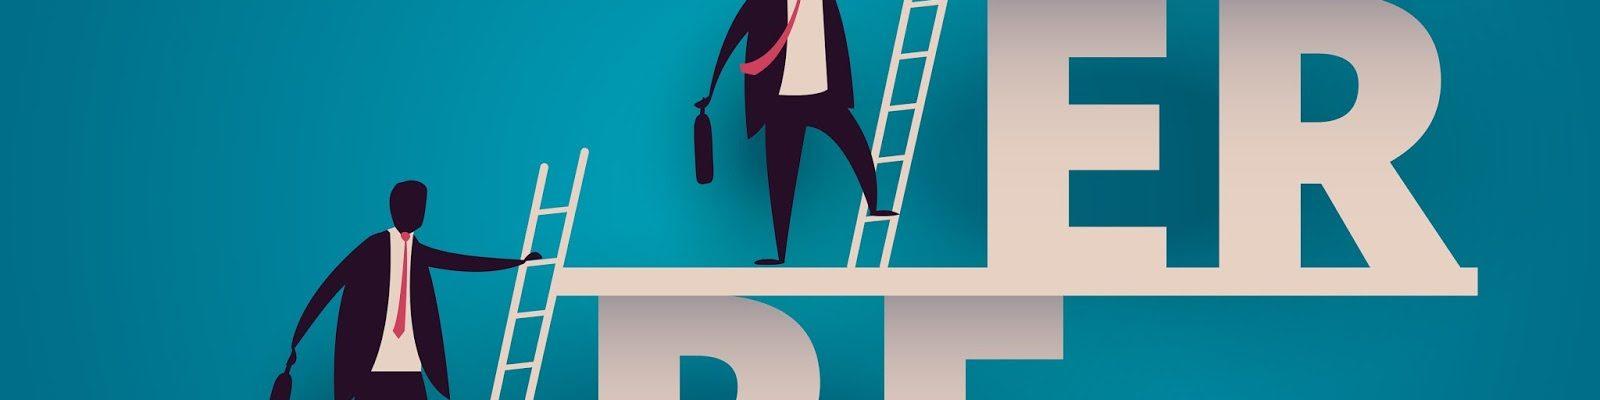 Network Marketing Etiquette - Does Network Marketing Etiquette Really Matter?